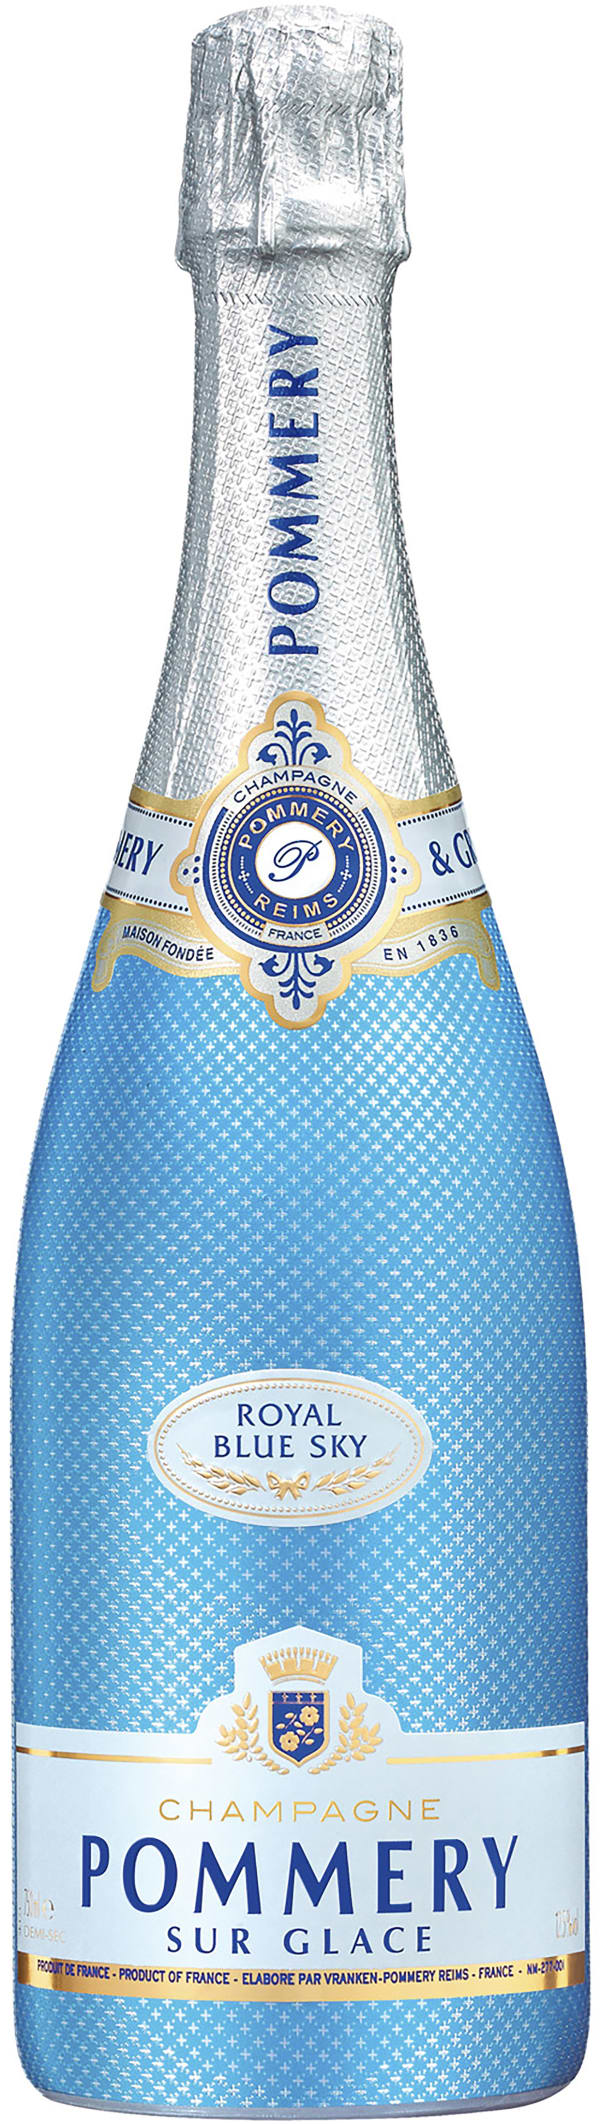 Pommery Royal Blue Sky Champagne Demi-Sec